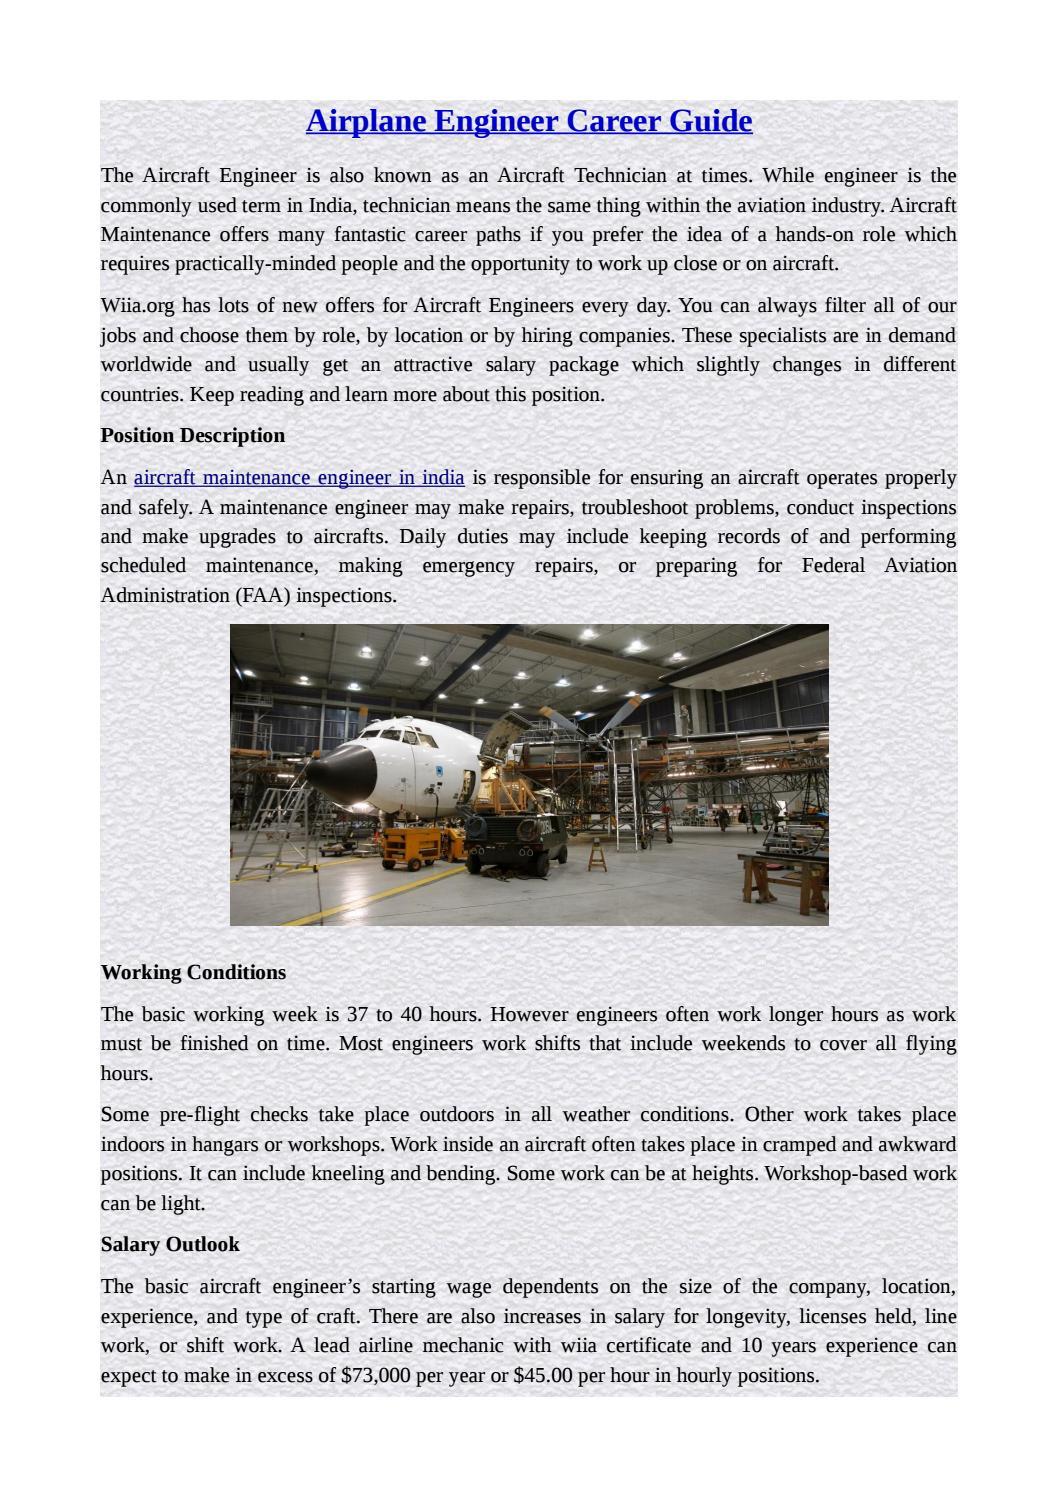 Airplane Engineer Career Guide By Wiiia Org Issuu